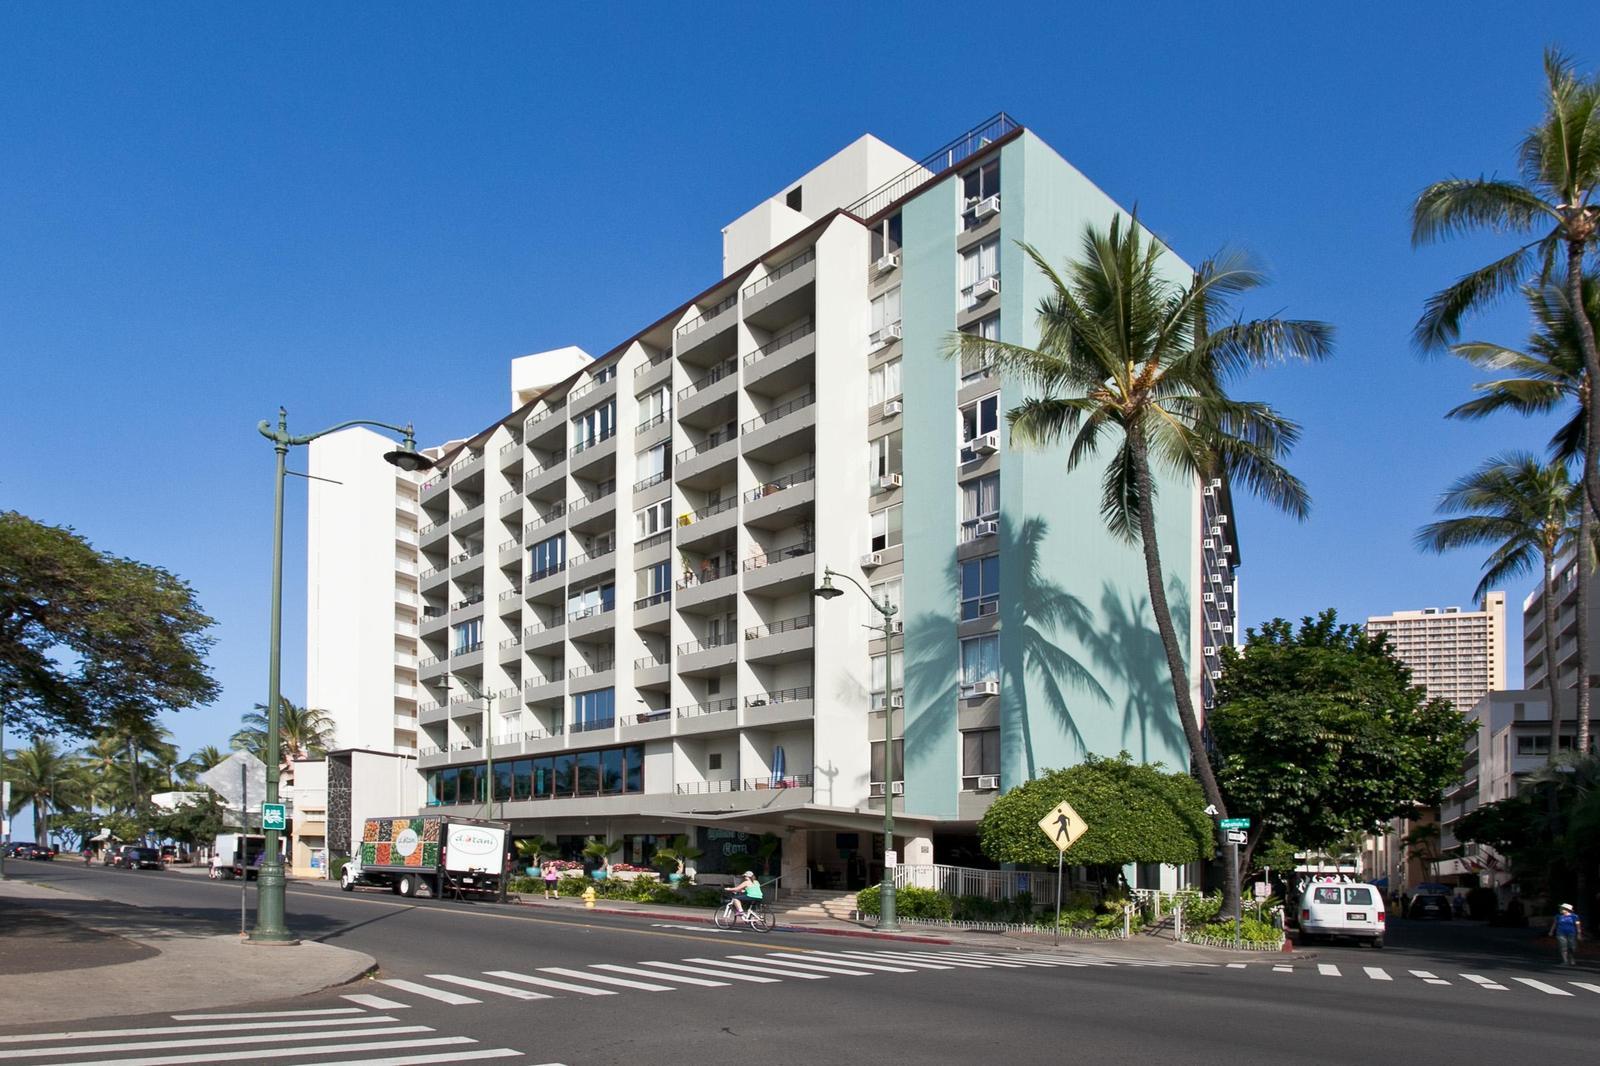 Our Buiding - Waikiki Grand Hotel